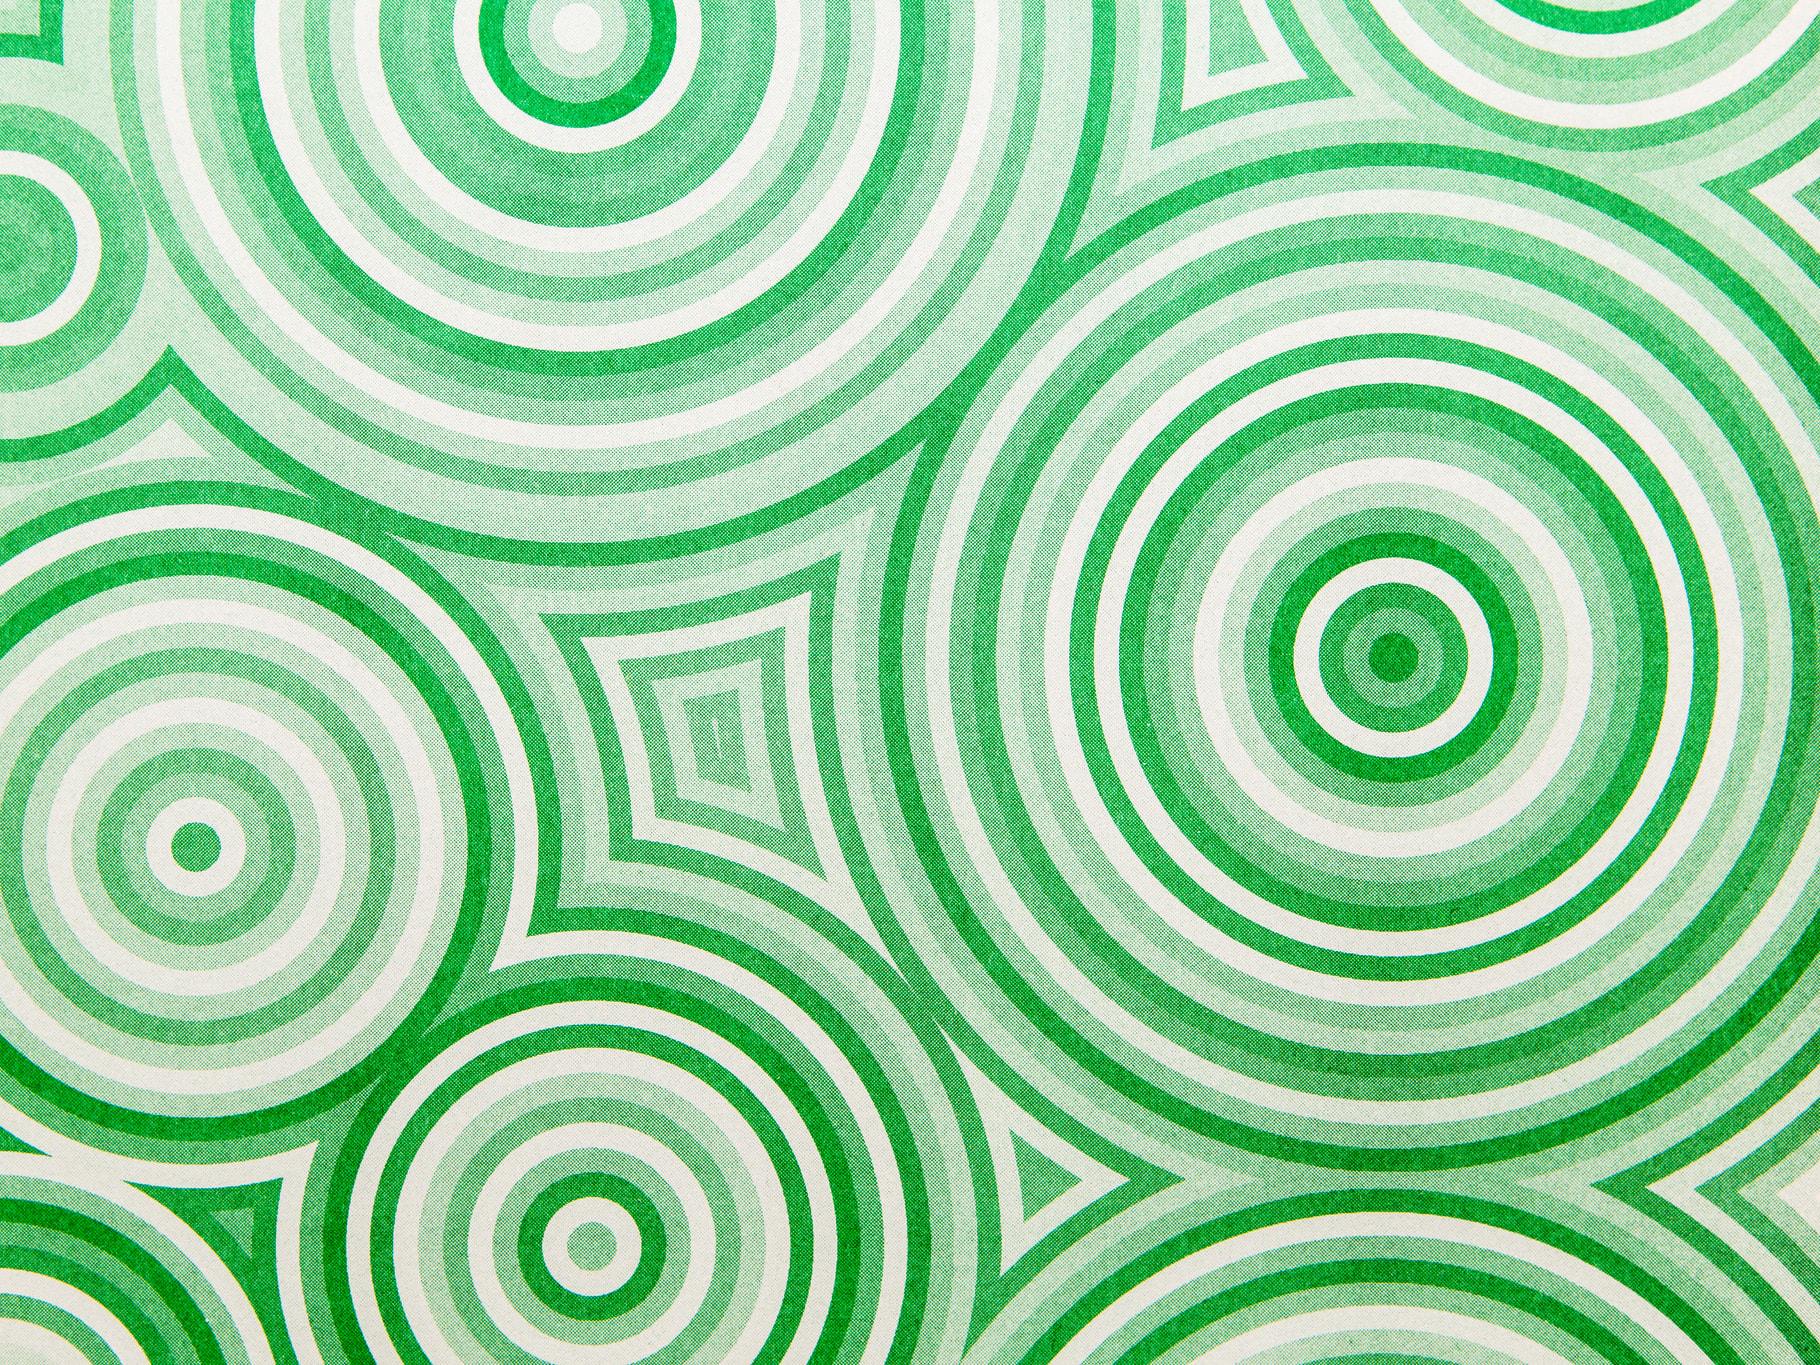 swirling green circles